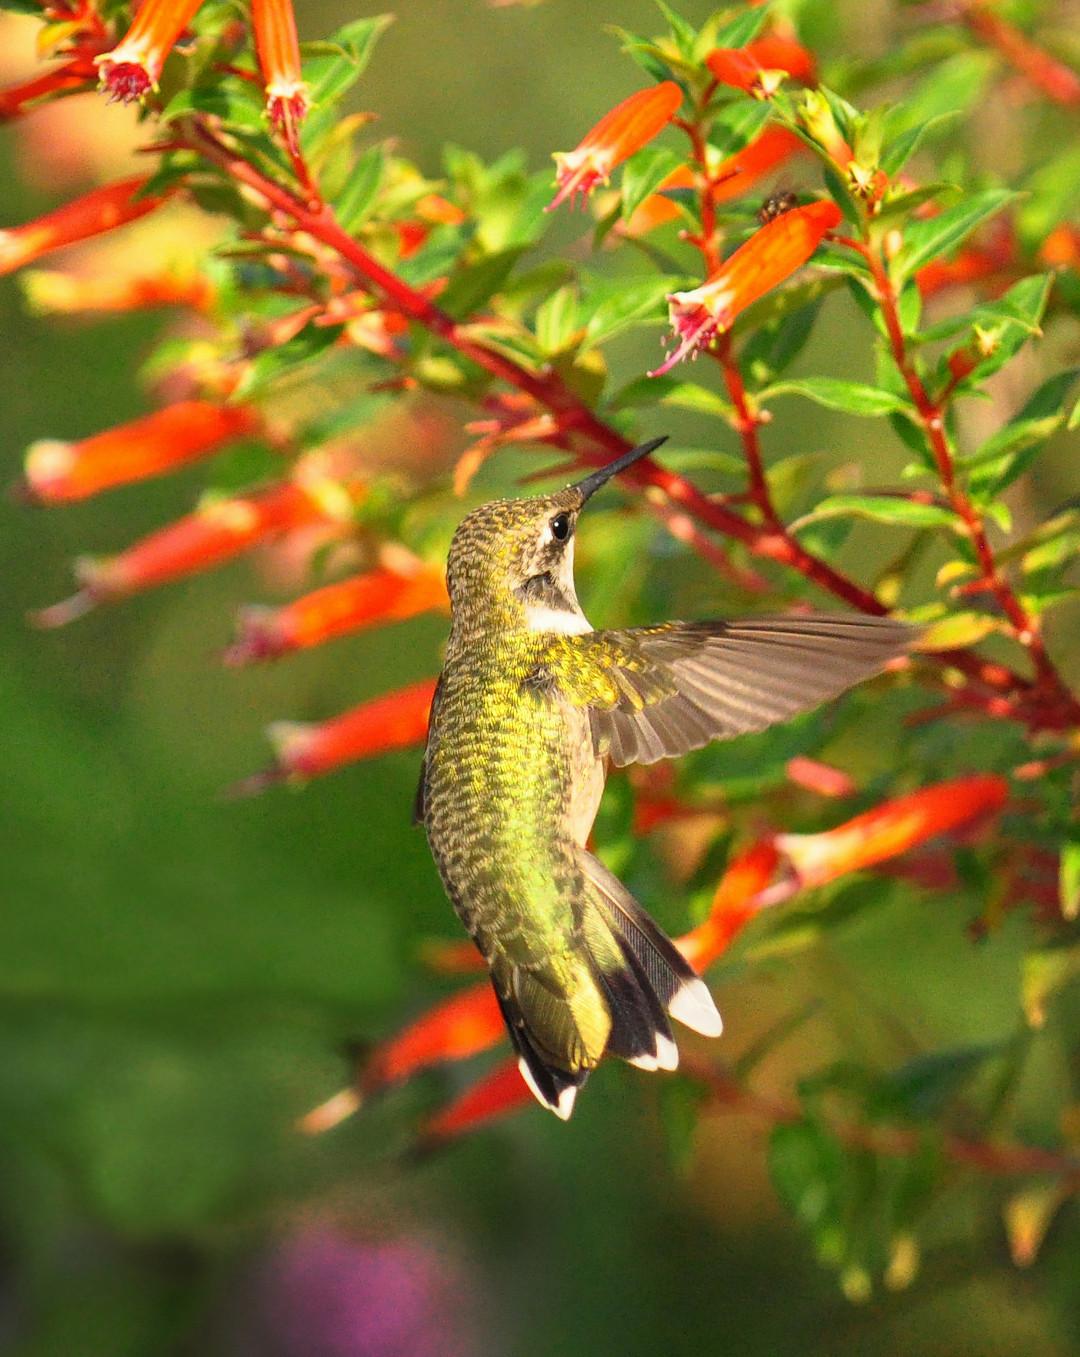 hummingbird sipping from a cigar flower